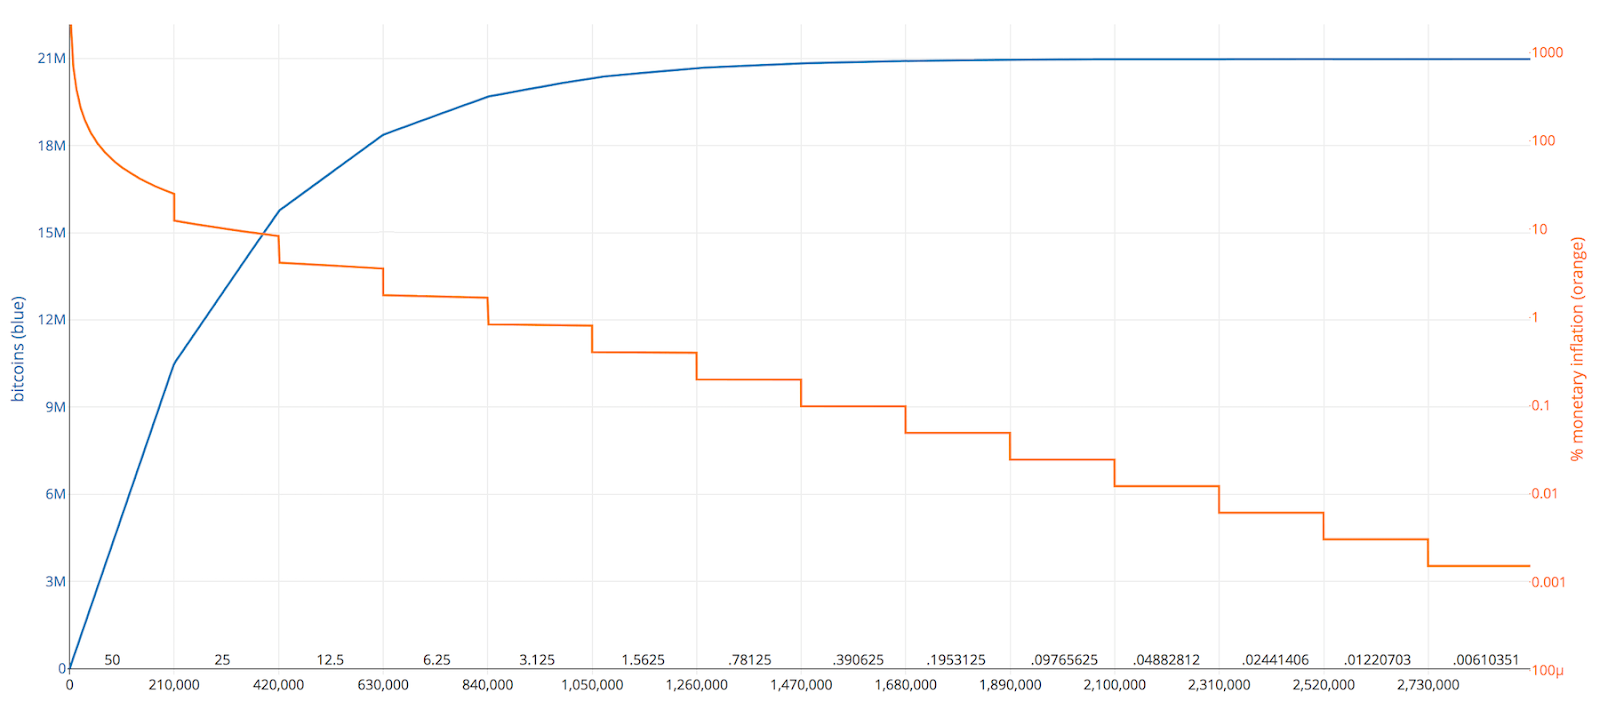 BTC difficulty chart